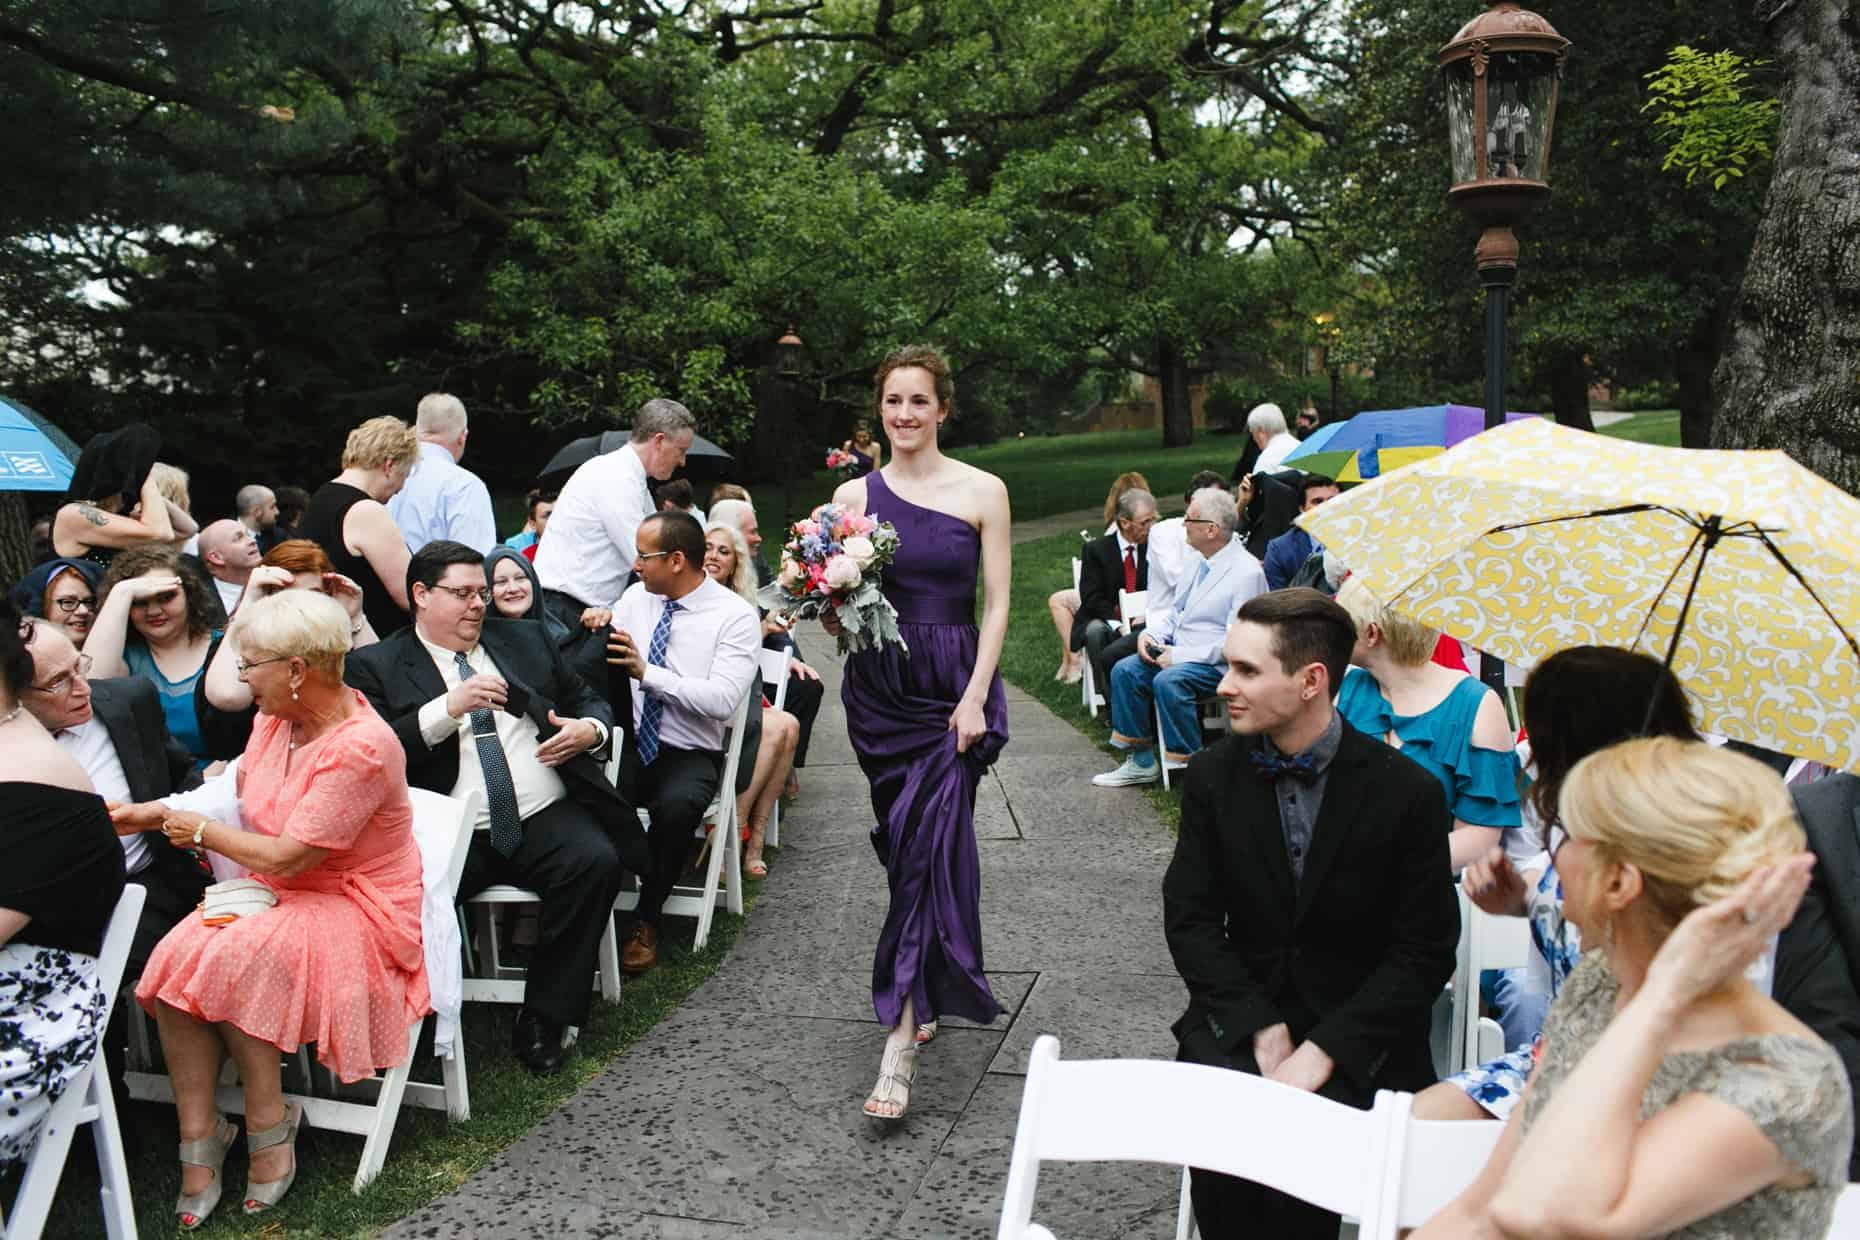 Bucks County Mansion Wedding Ceremony